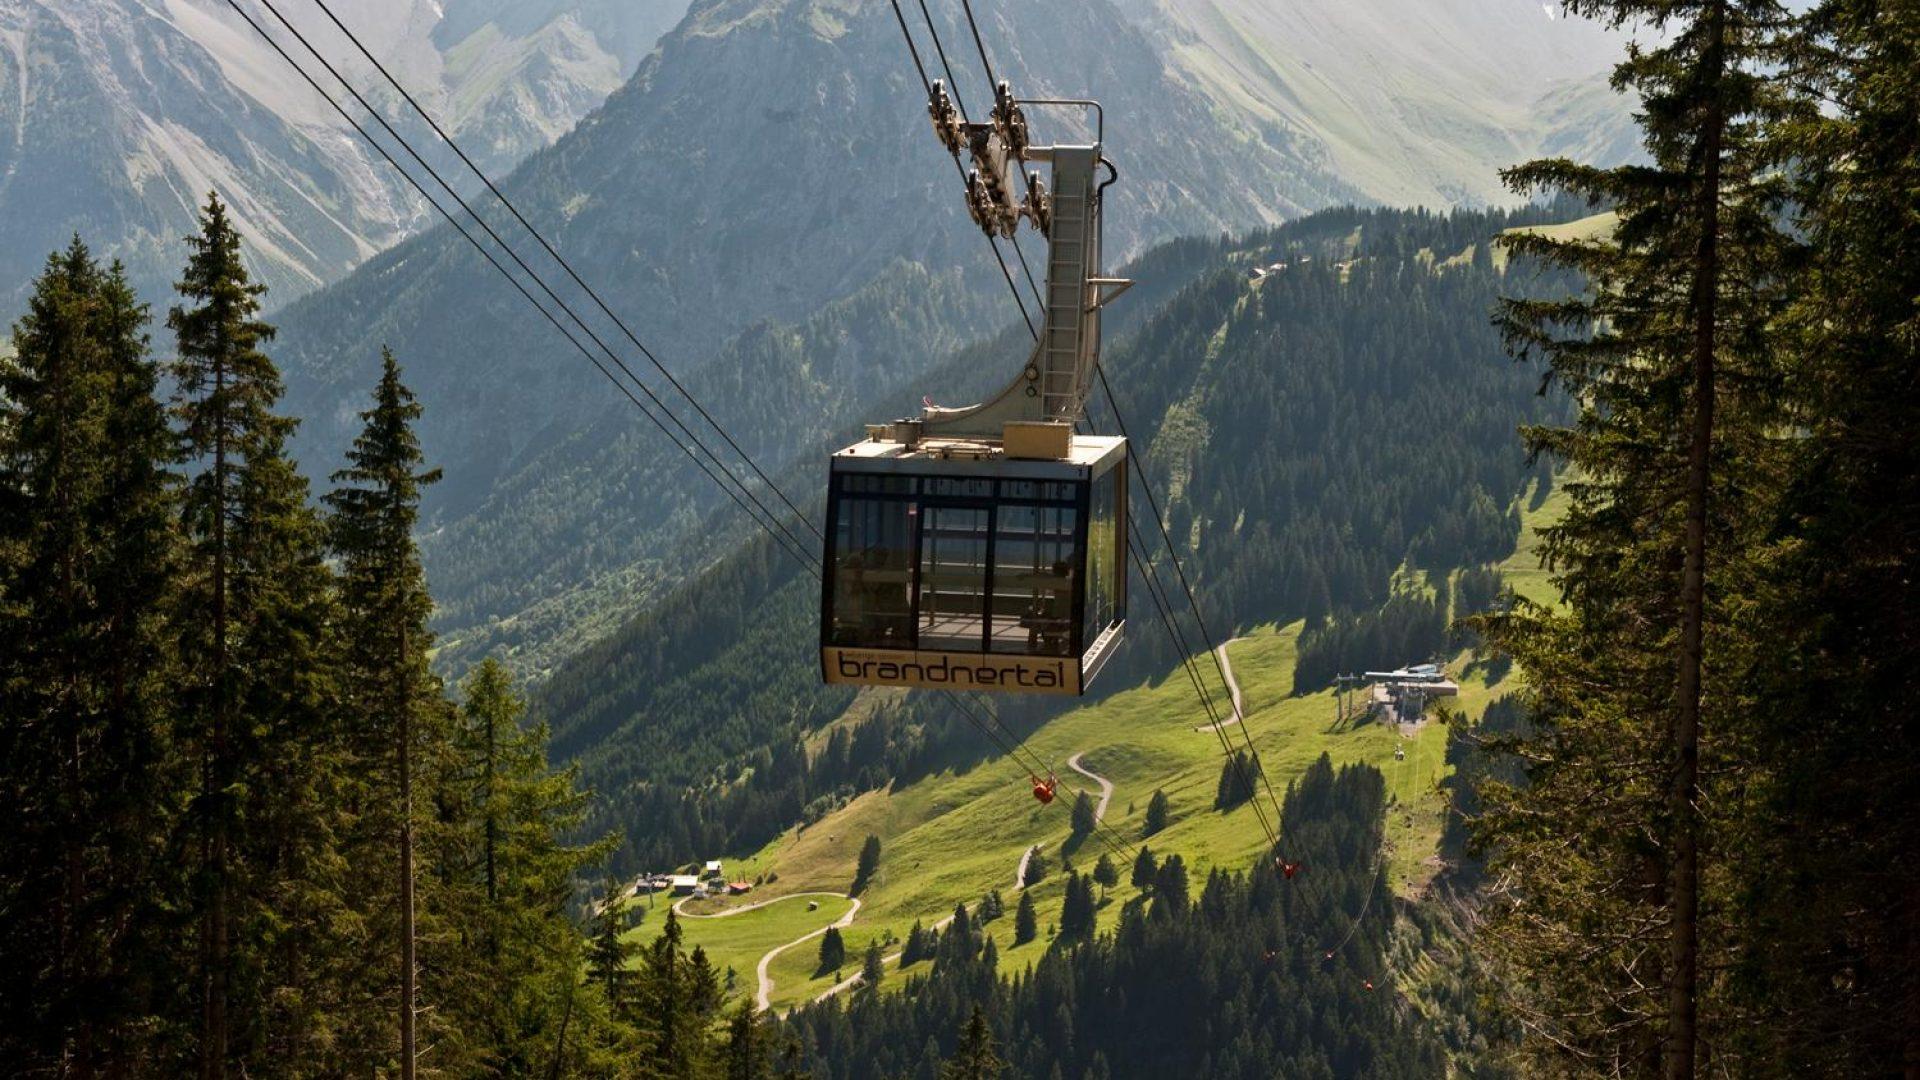 Bergbahnen Brandnertal